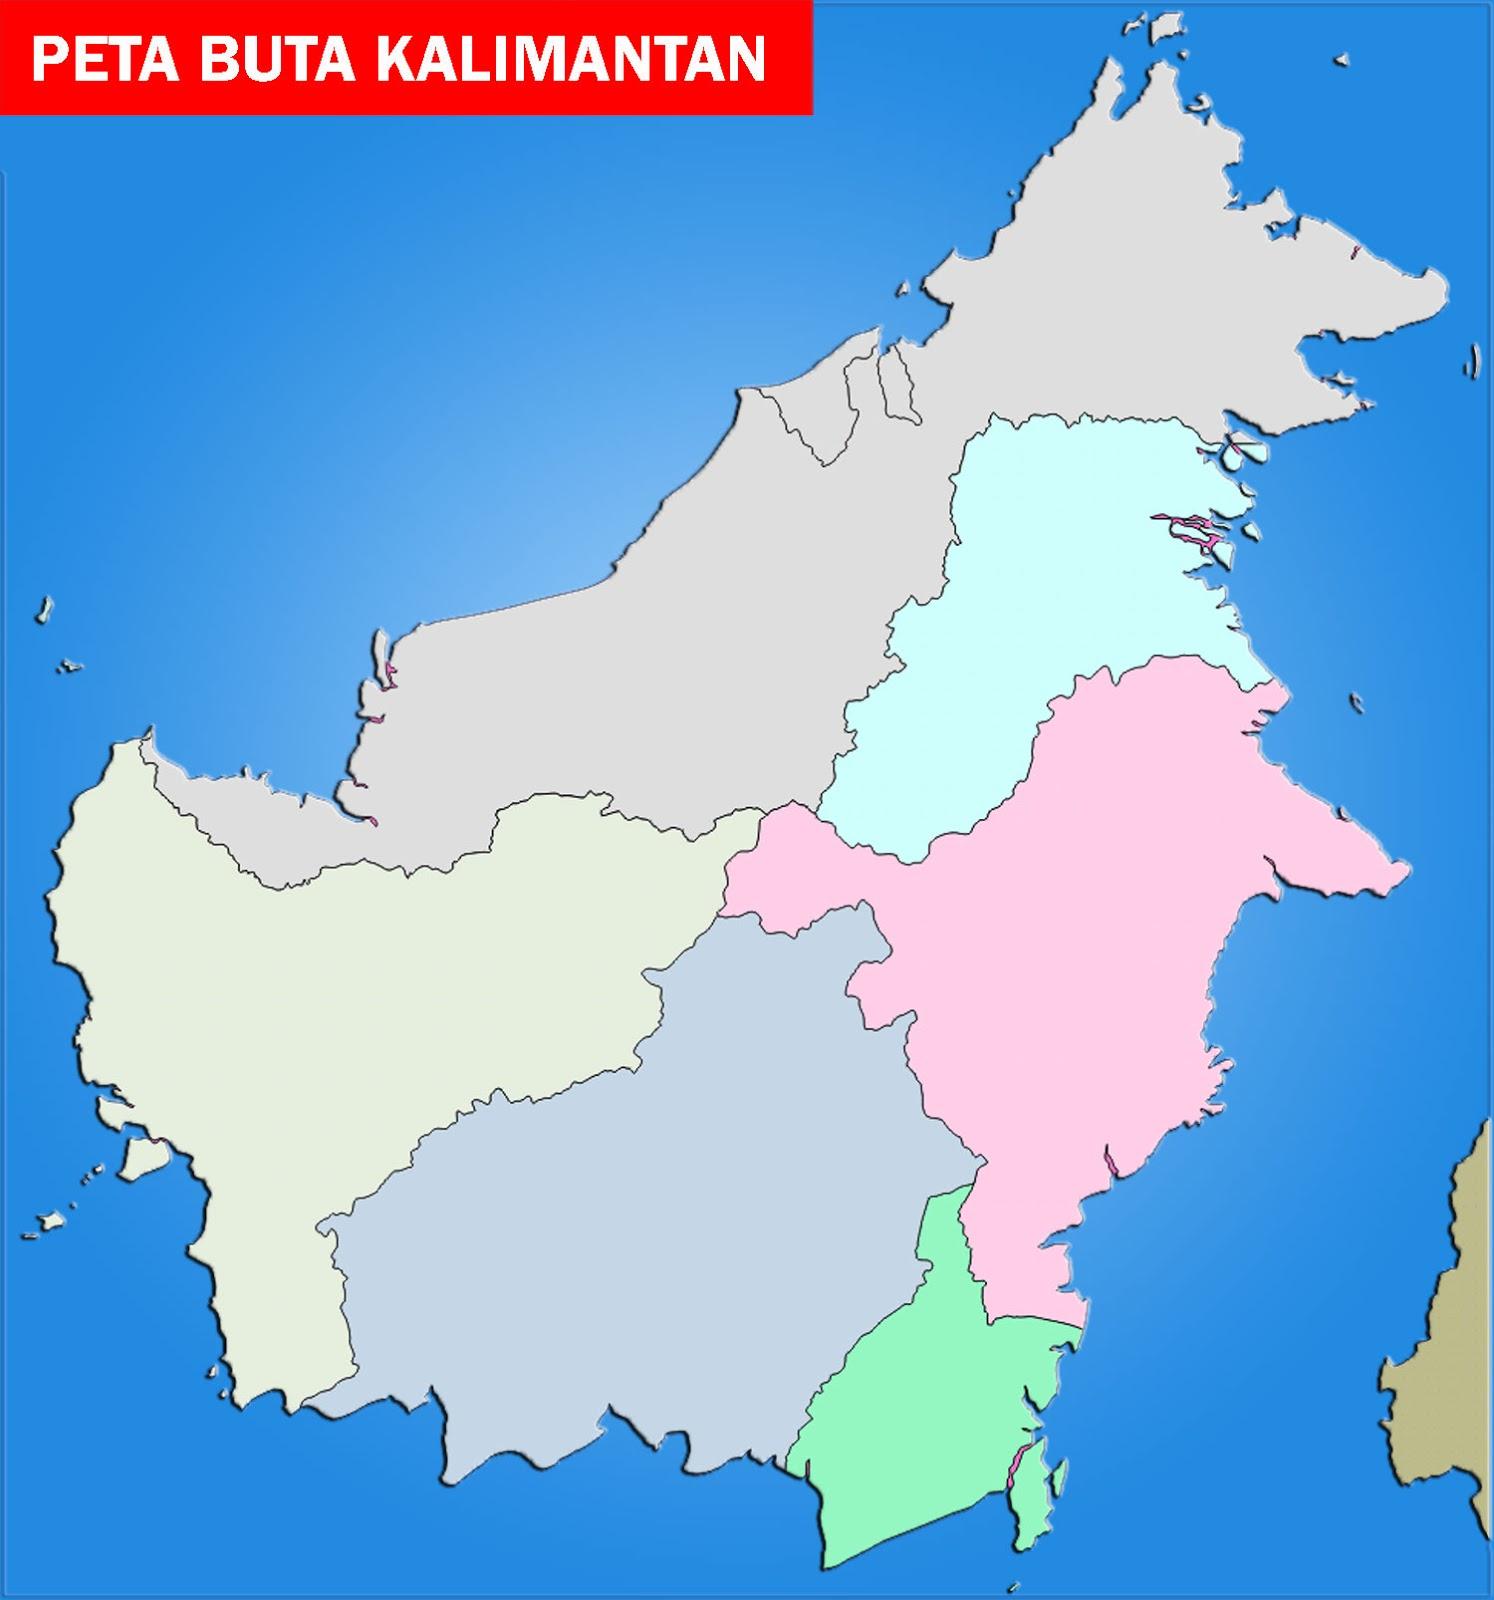 Peta Kalimantan Lengkap 5 Provinsi Sejarah Negara Gambar Buta Sketsa